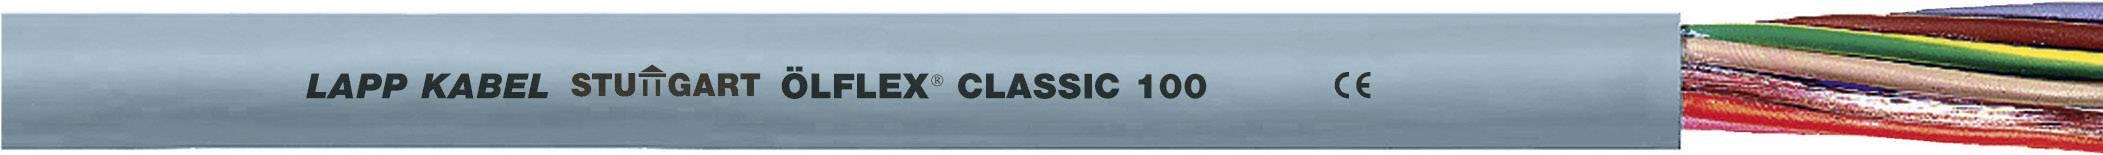 Kabel LappKabel Ölflex CLASSIC 100 6G0,75 (0010025), PVC, 7,3 mm, 500 V, šedá, 1000 m